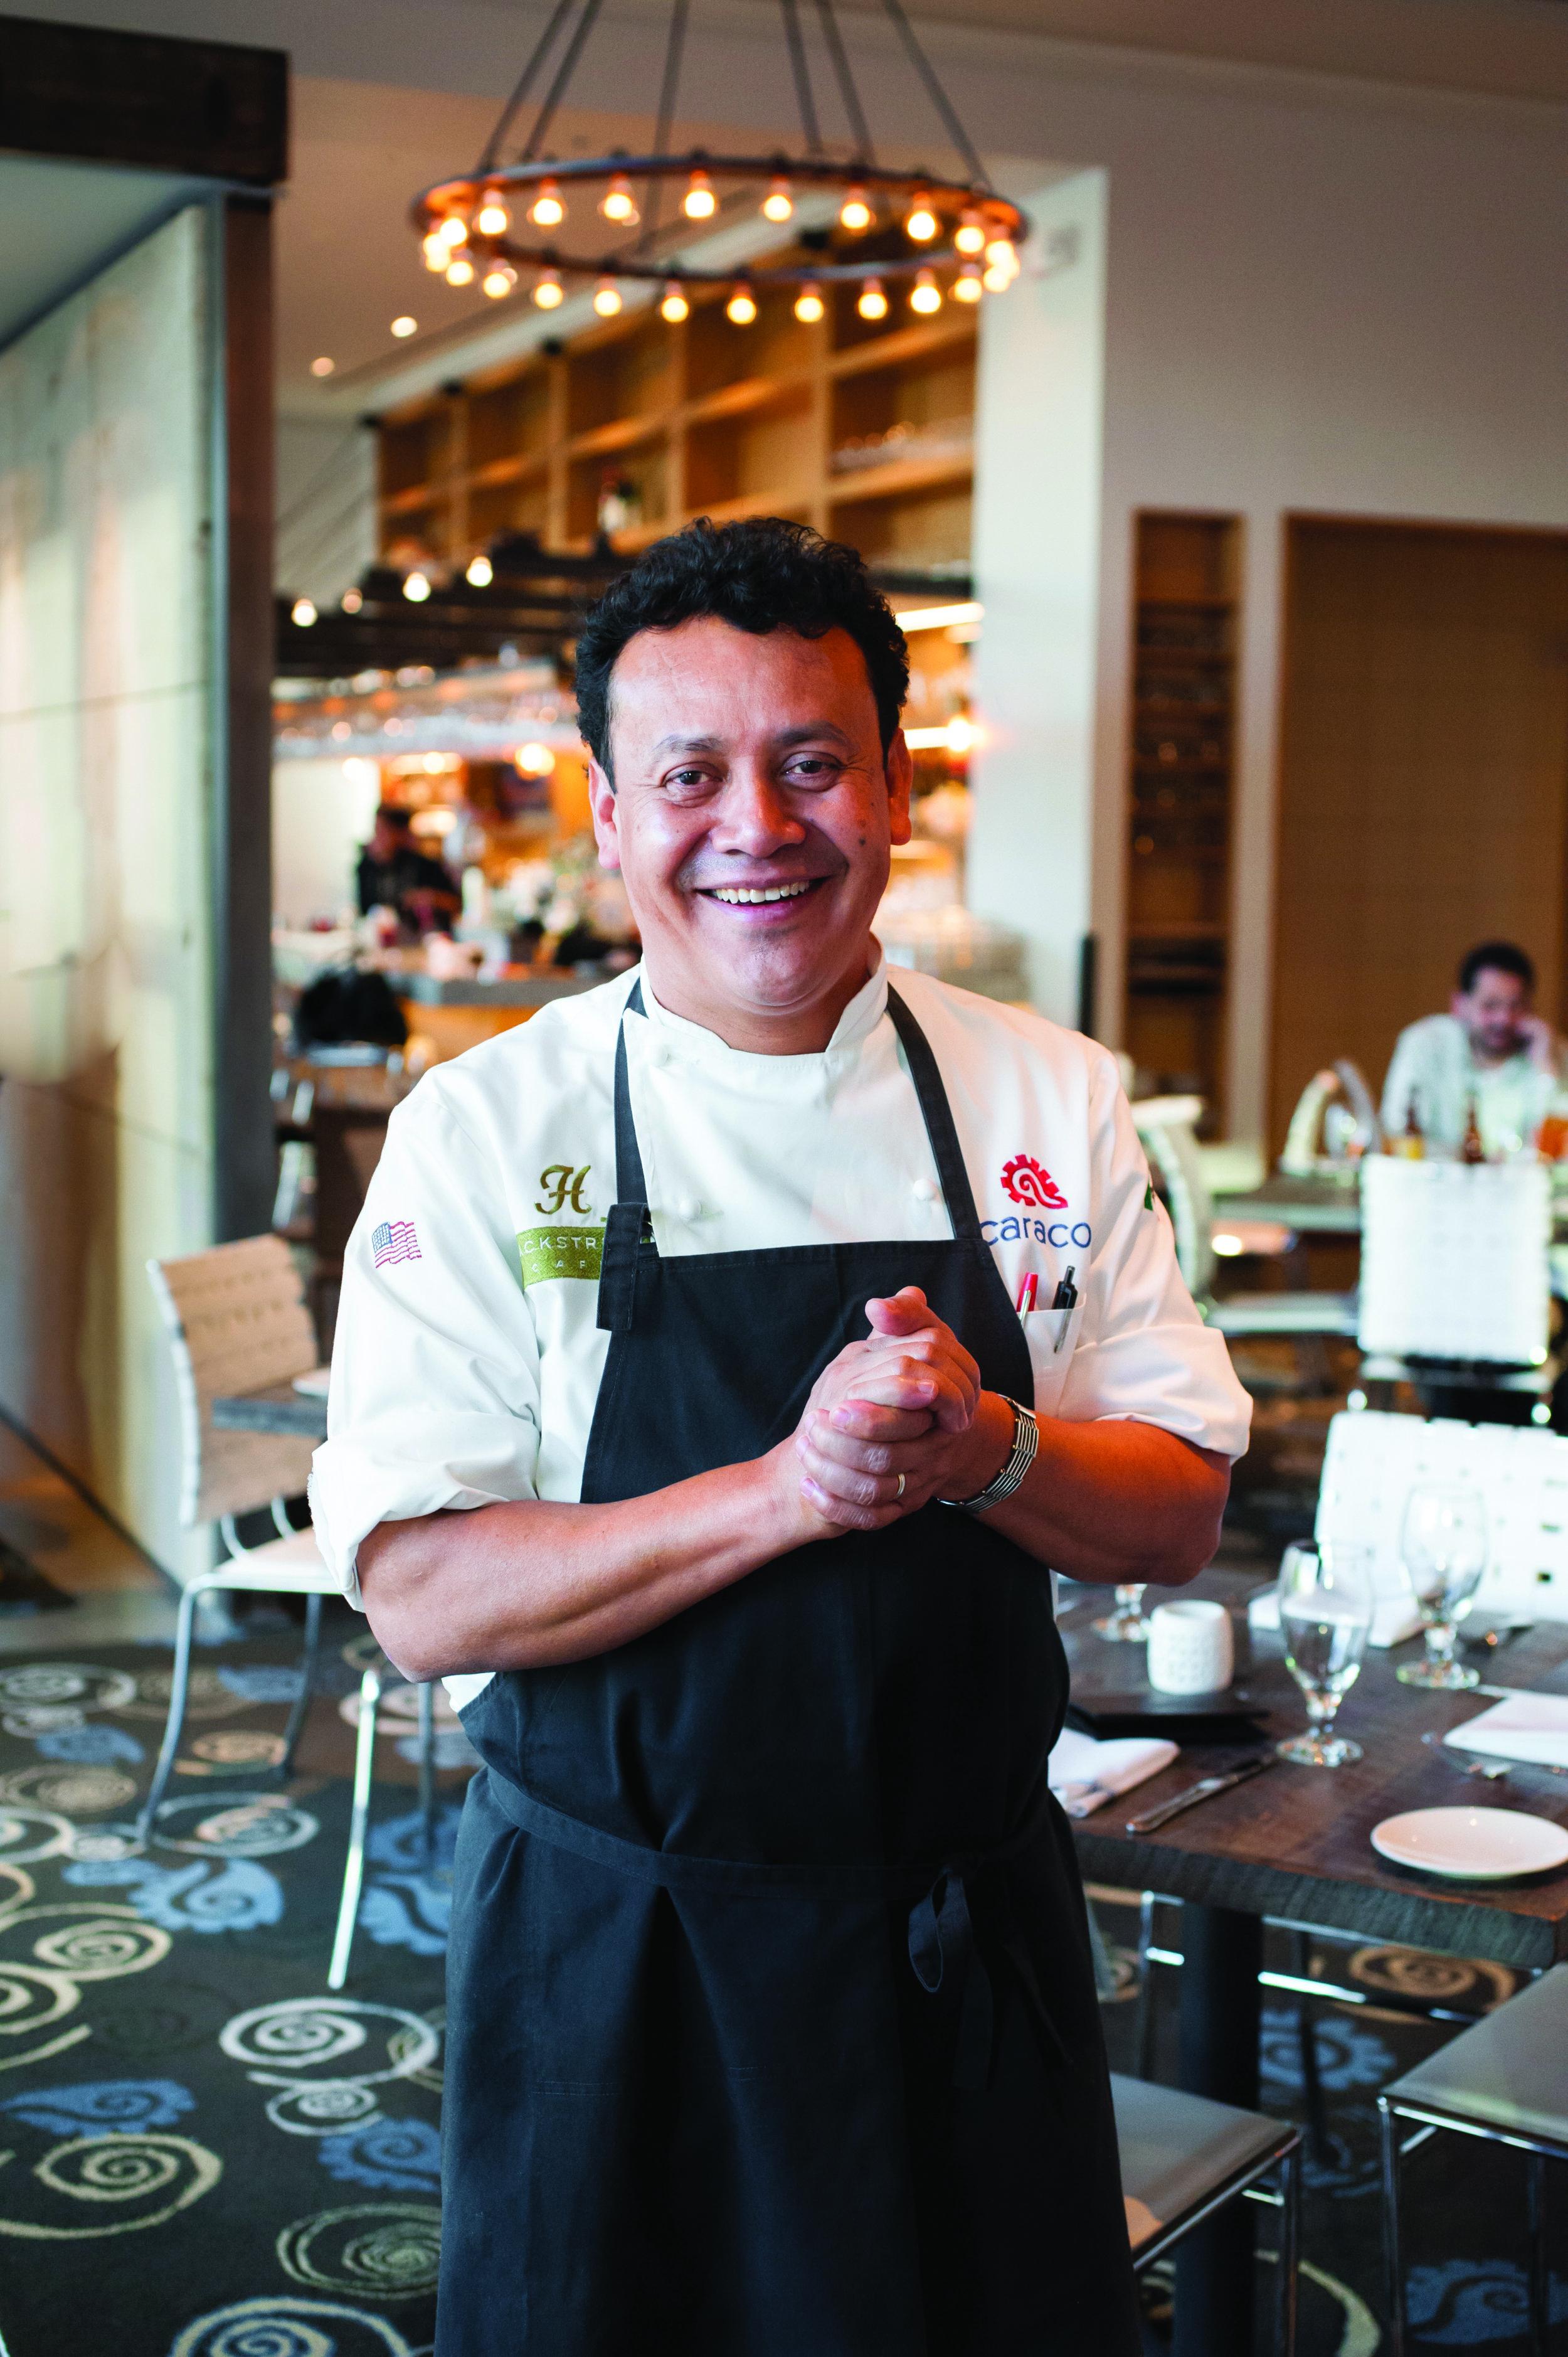 HTown Restaurant Group Houston, TX  Hugo's | Caracol | Backstreet Café | Xochi  Houston, TX  James Beard Award Best Chef Southwest winner, 2017; finalist, 2012, 2013, 2014, 2015, 2016  htownrestaurantgroup.com